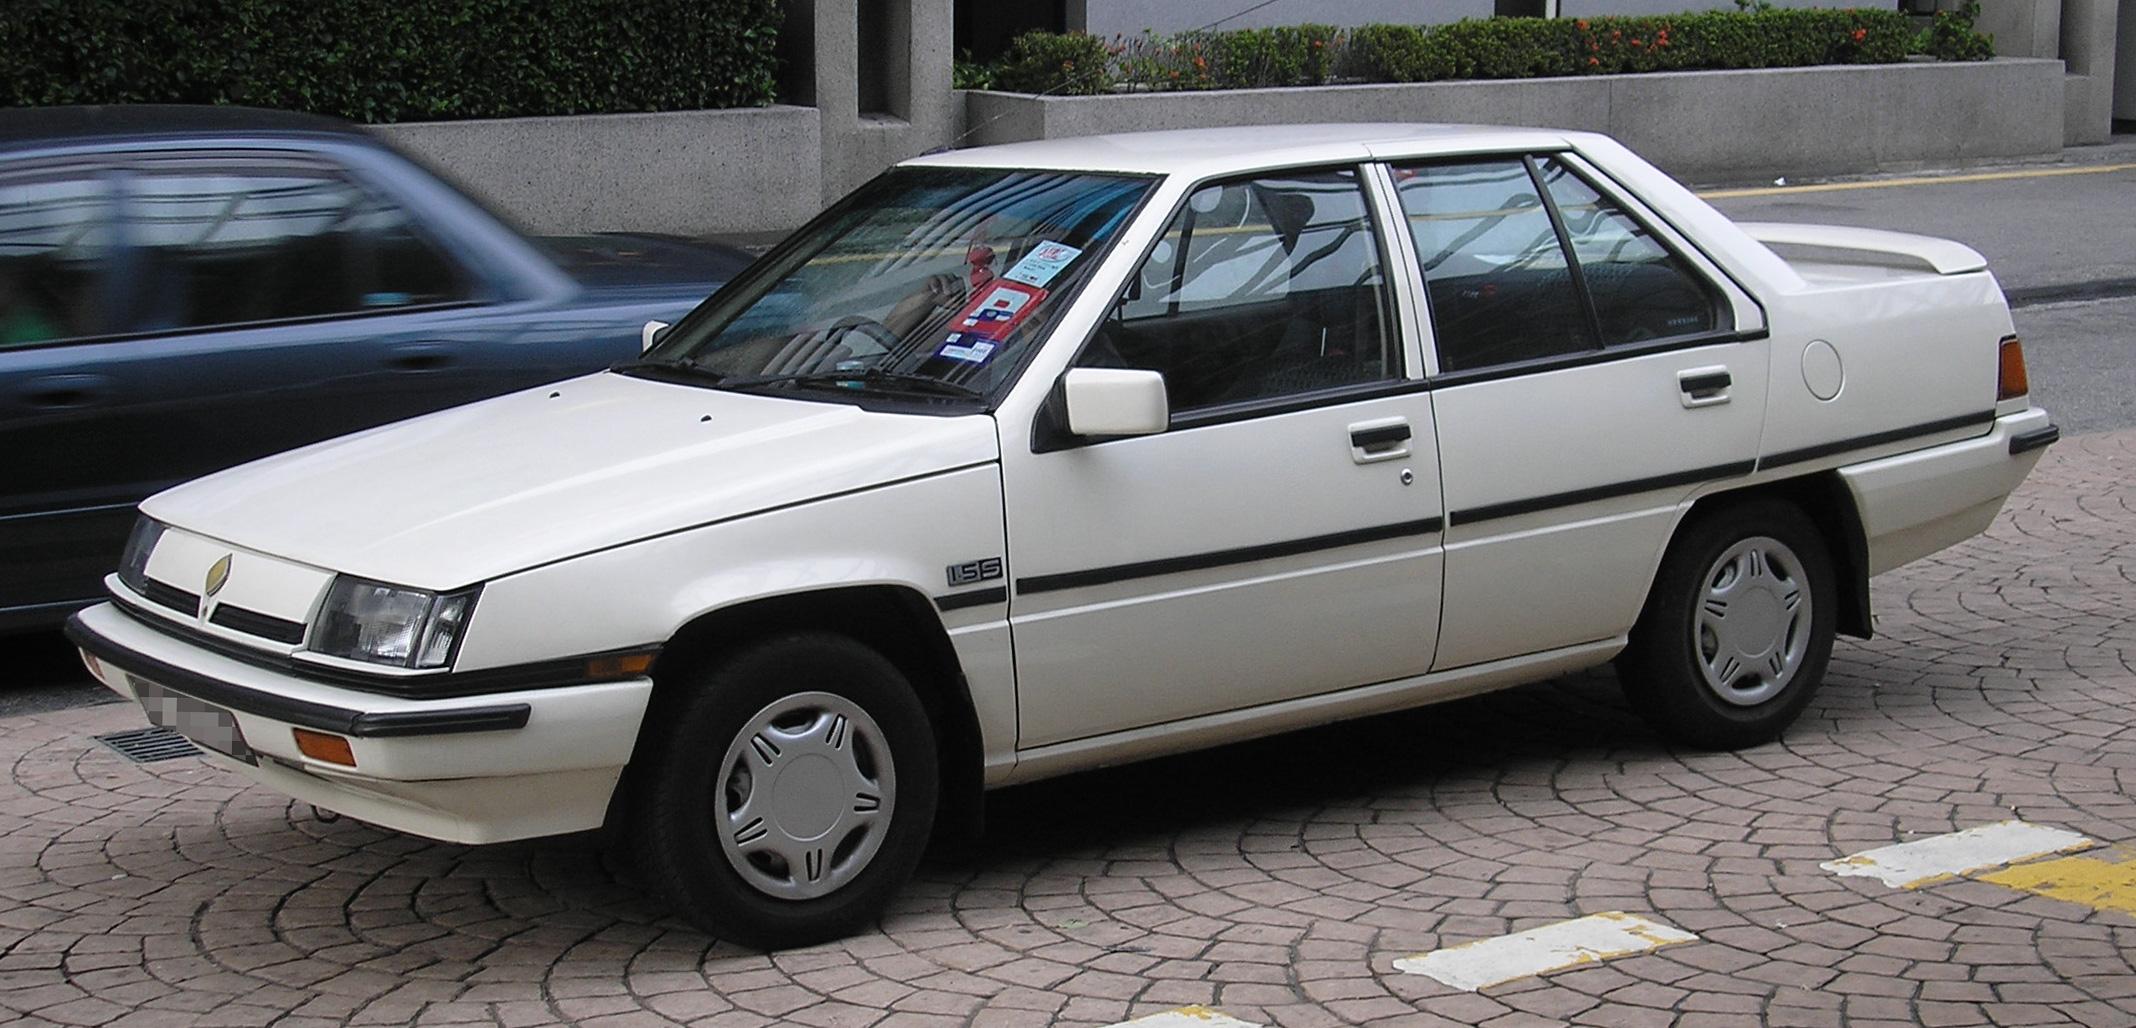 http://upload.wikimedia.org/wikipedia/commons/4/4c/First_generation_Proton_Saga,_Kuala_Lumpur.jpg